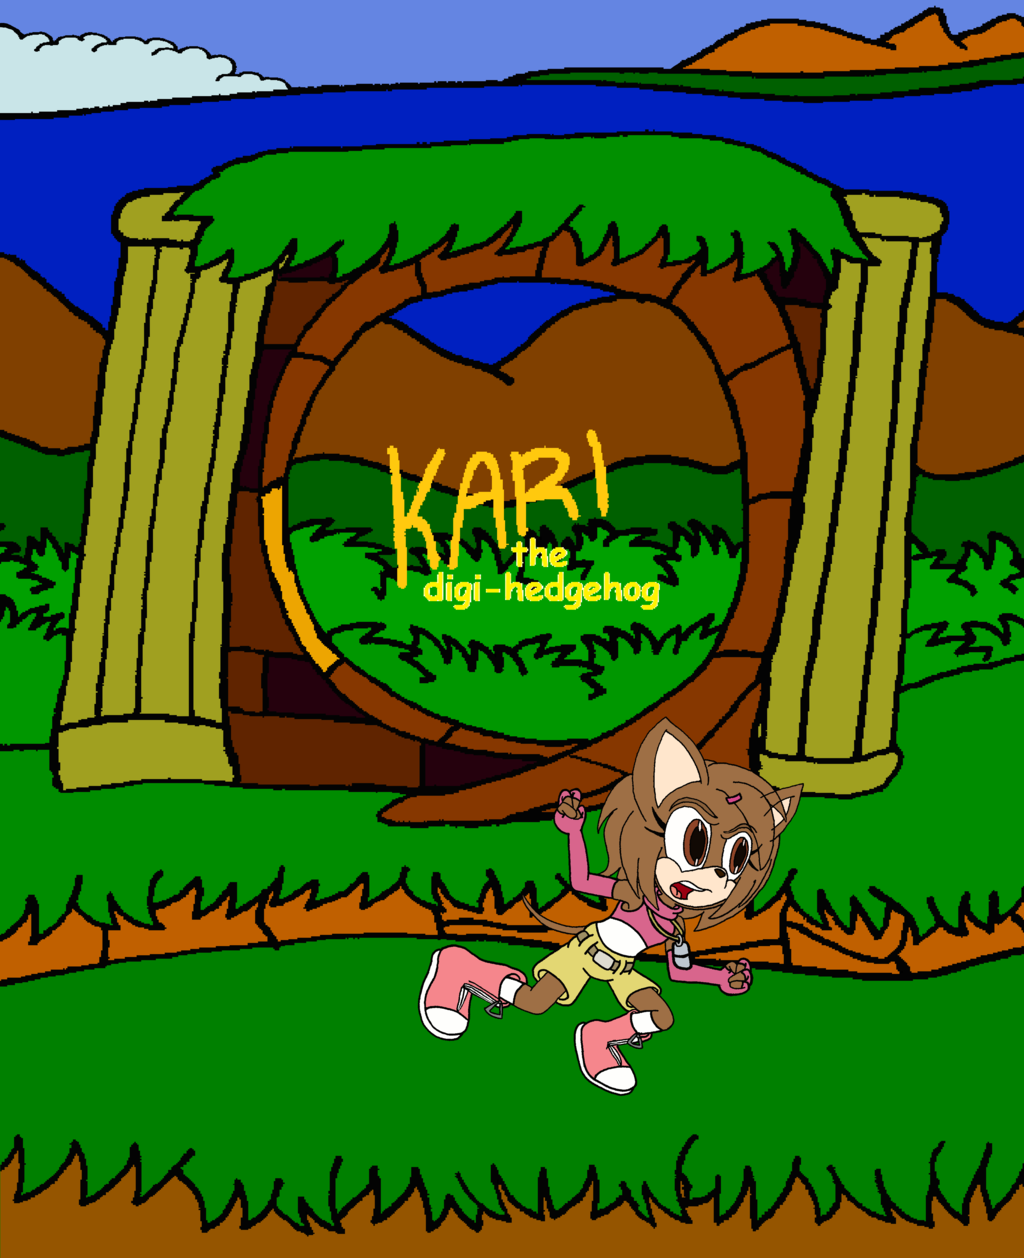 Kari the Digi-hedgehog